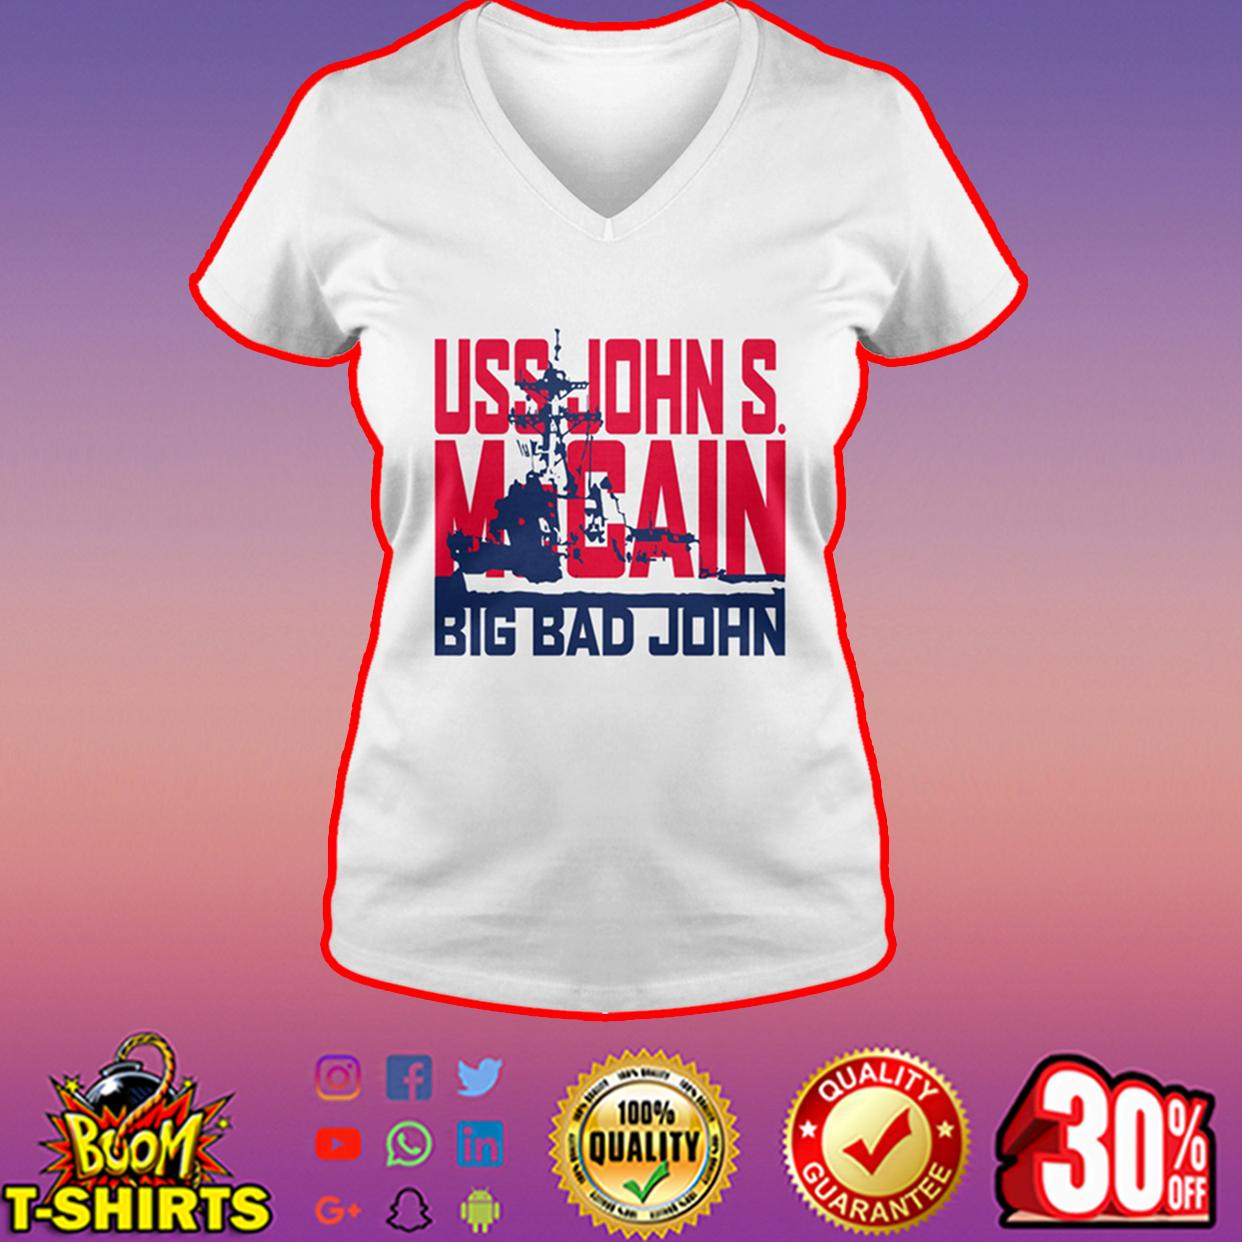 USS John S. McCain Big Bad John v-neck